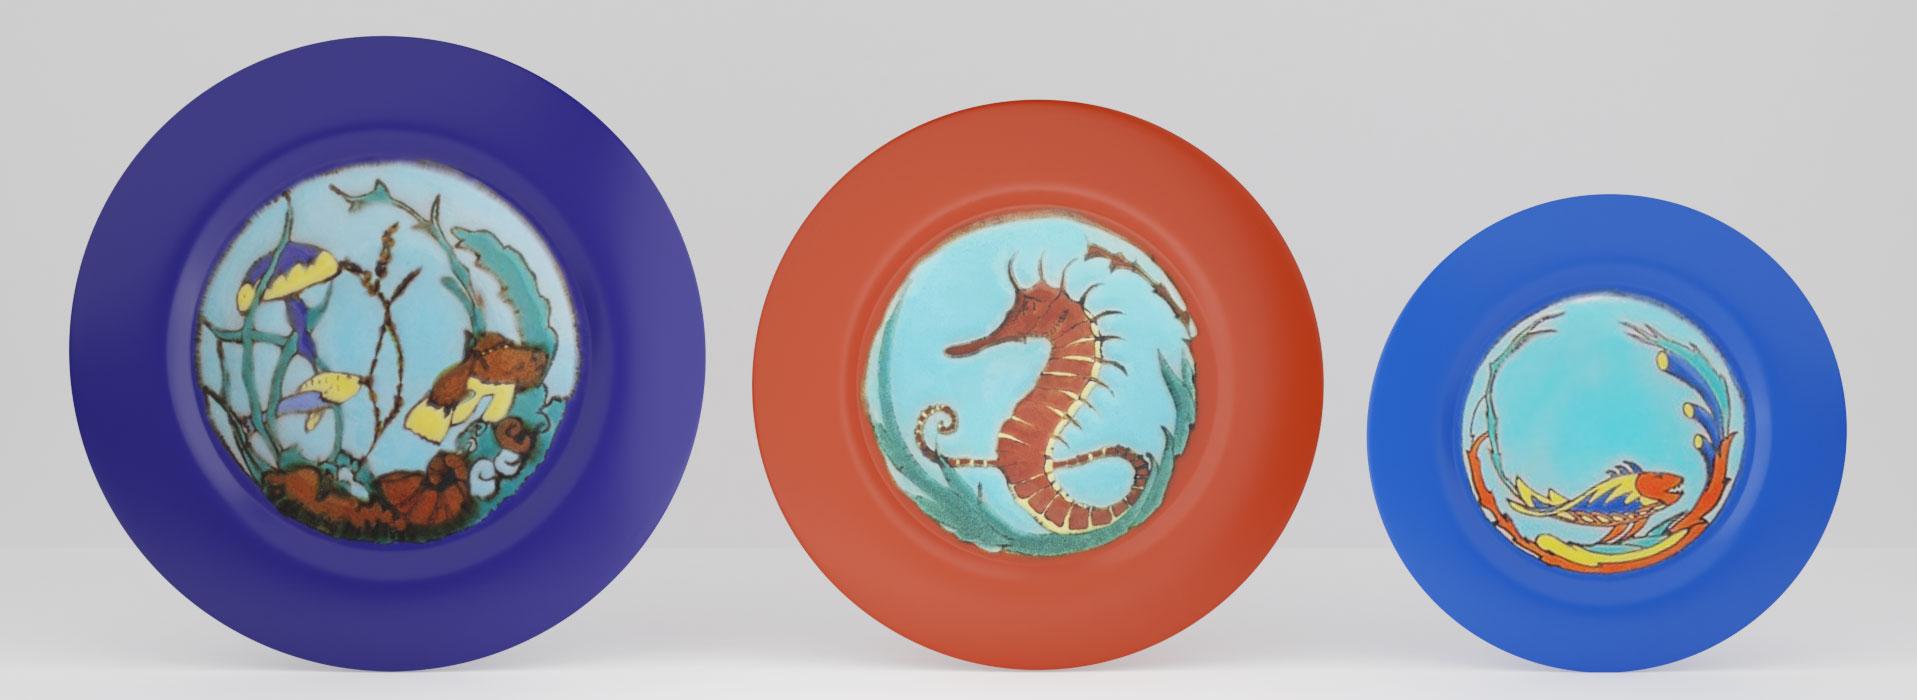 QwkDog Catalina Decorated Plates